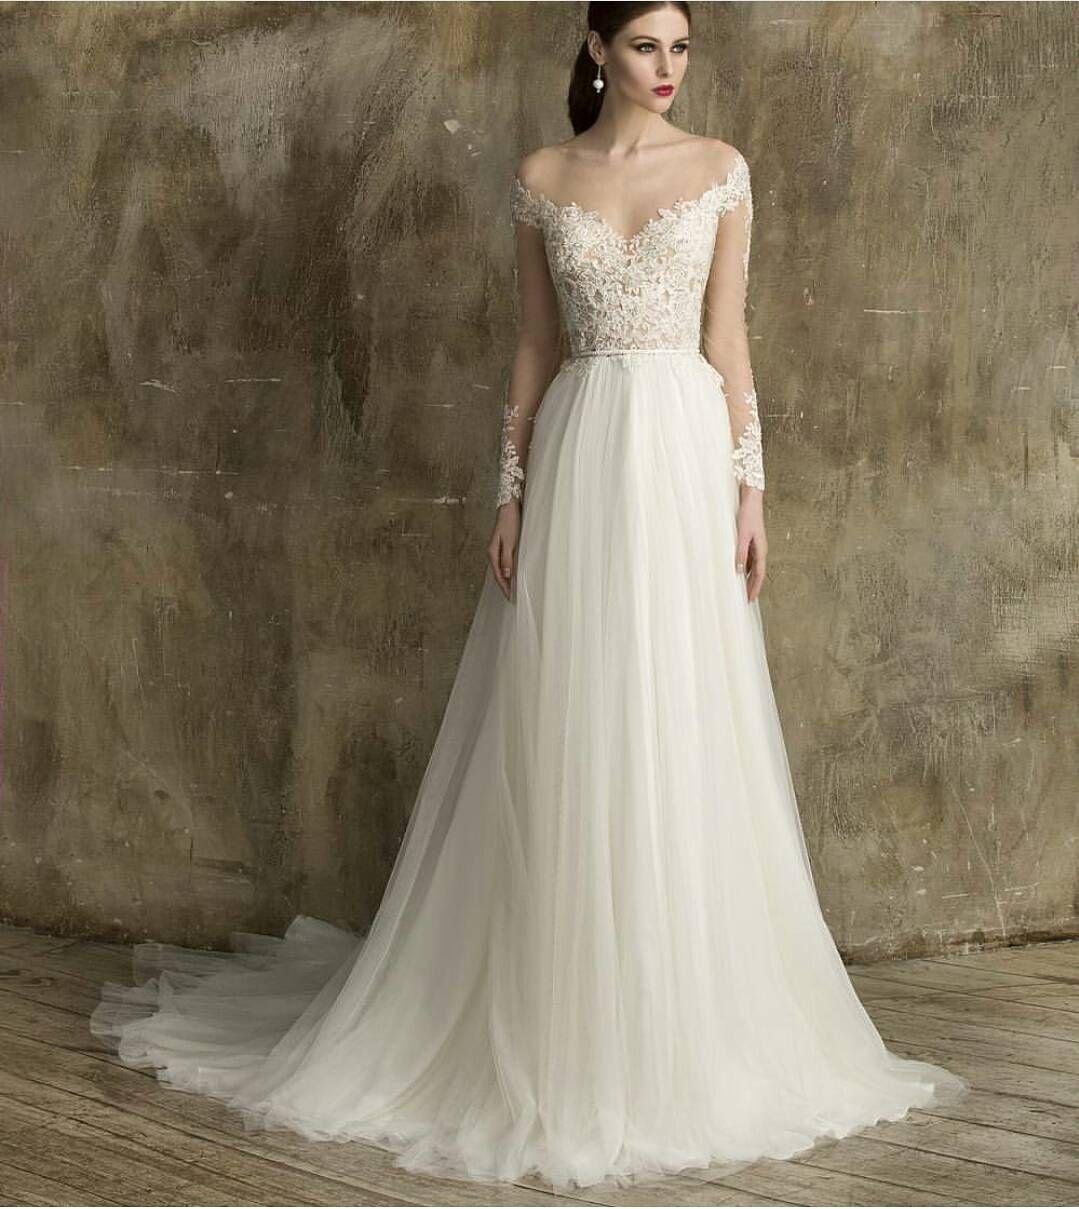 Semi formal dresses for wedding reception  Sheath  Column Plunging Neckline Sweep  Brush Train Lace Wedding